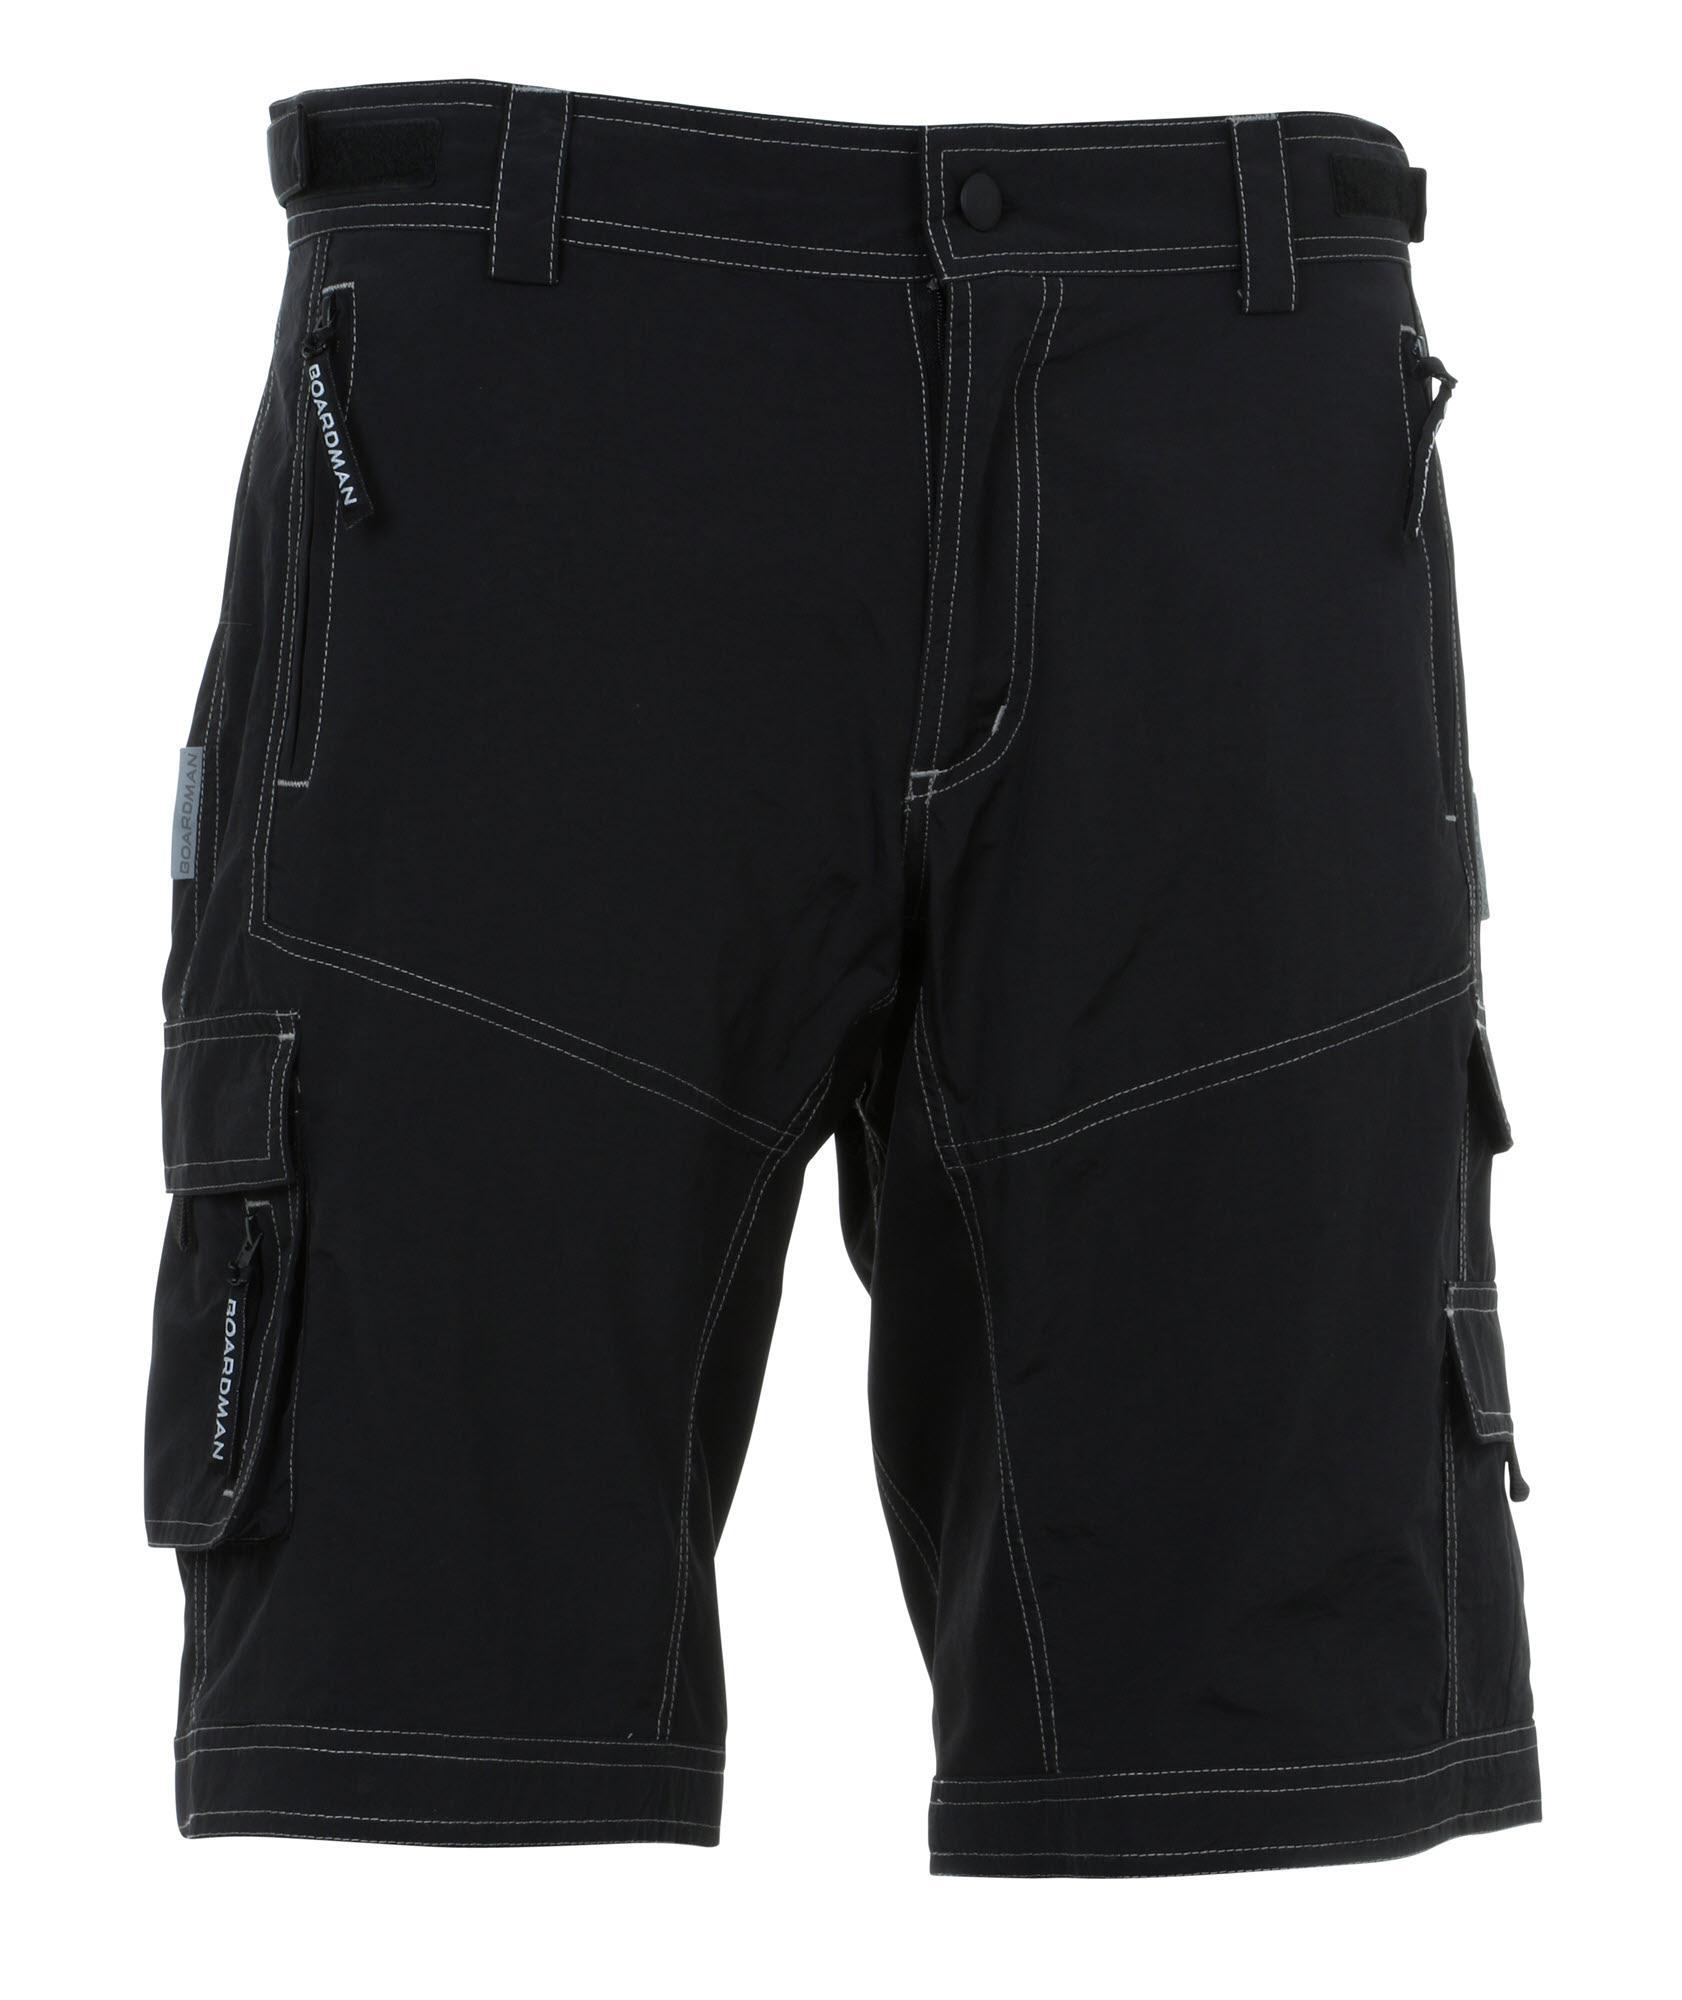 boardman mens mtb shorts - black